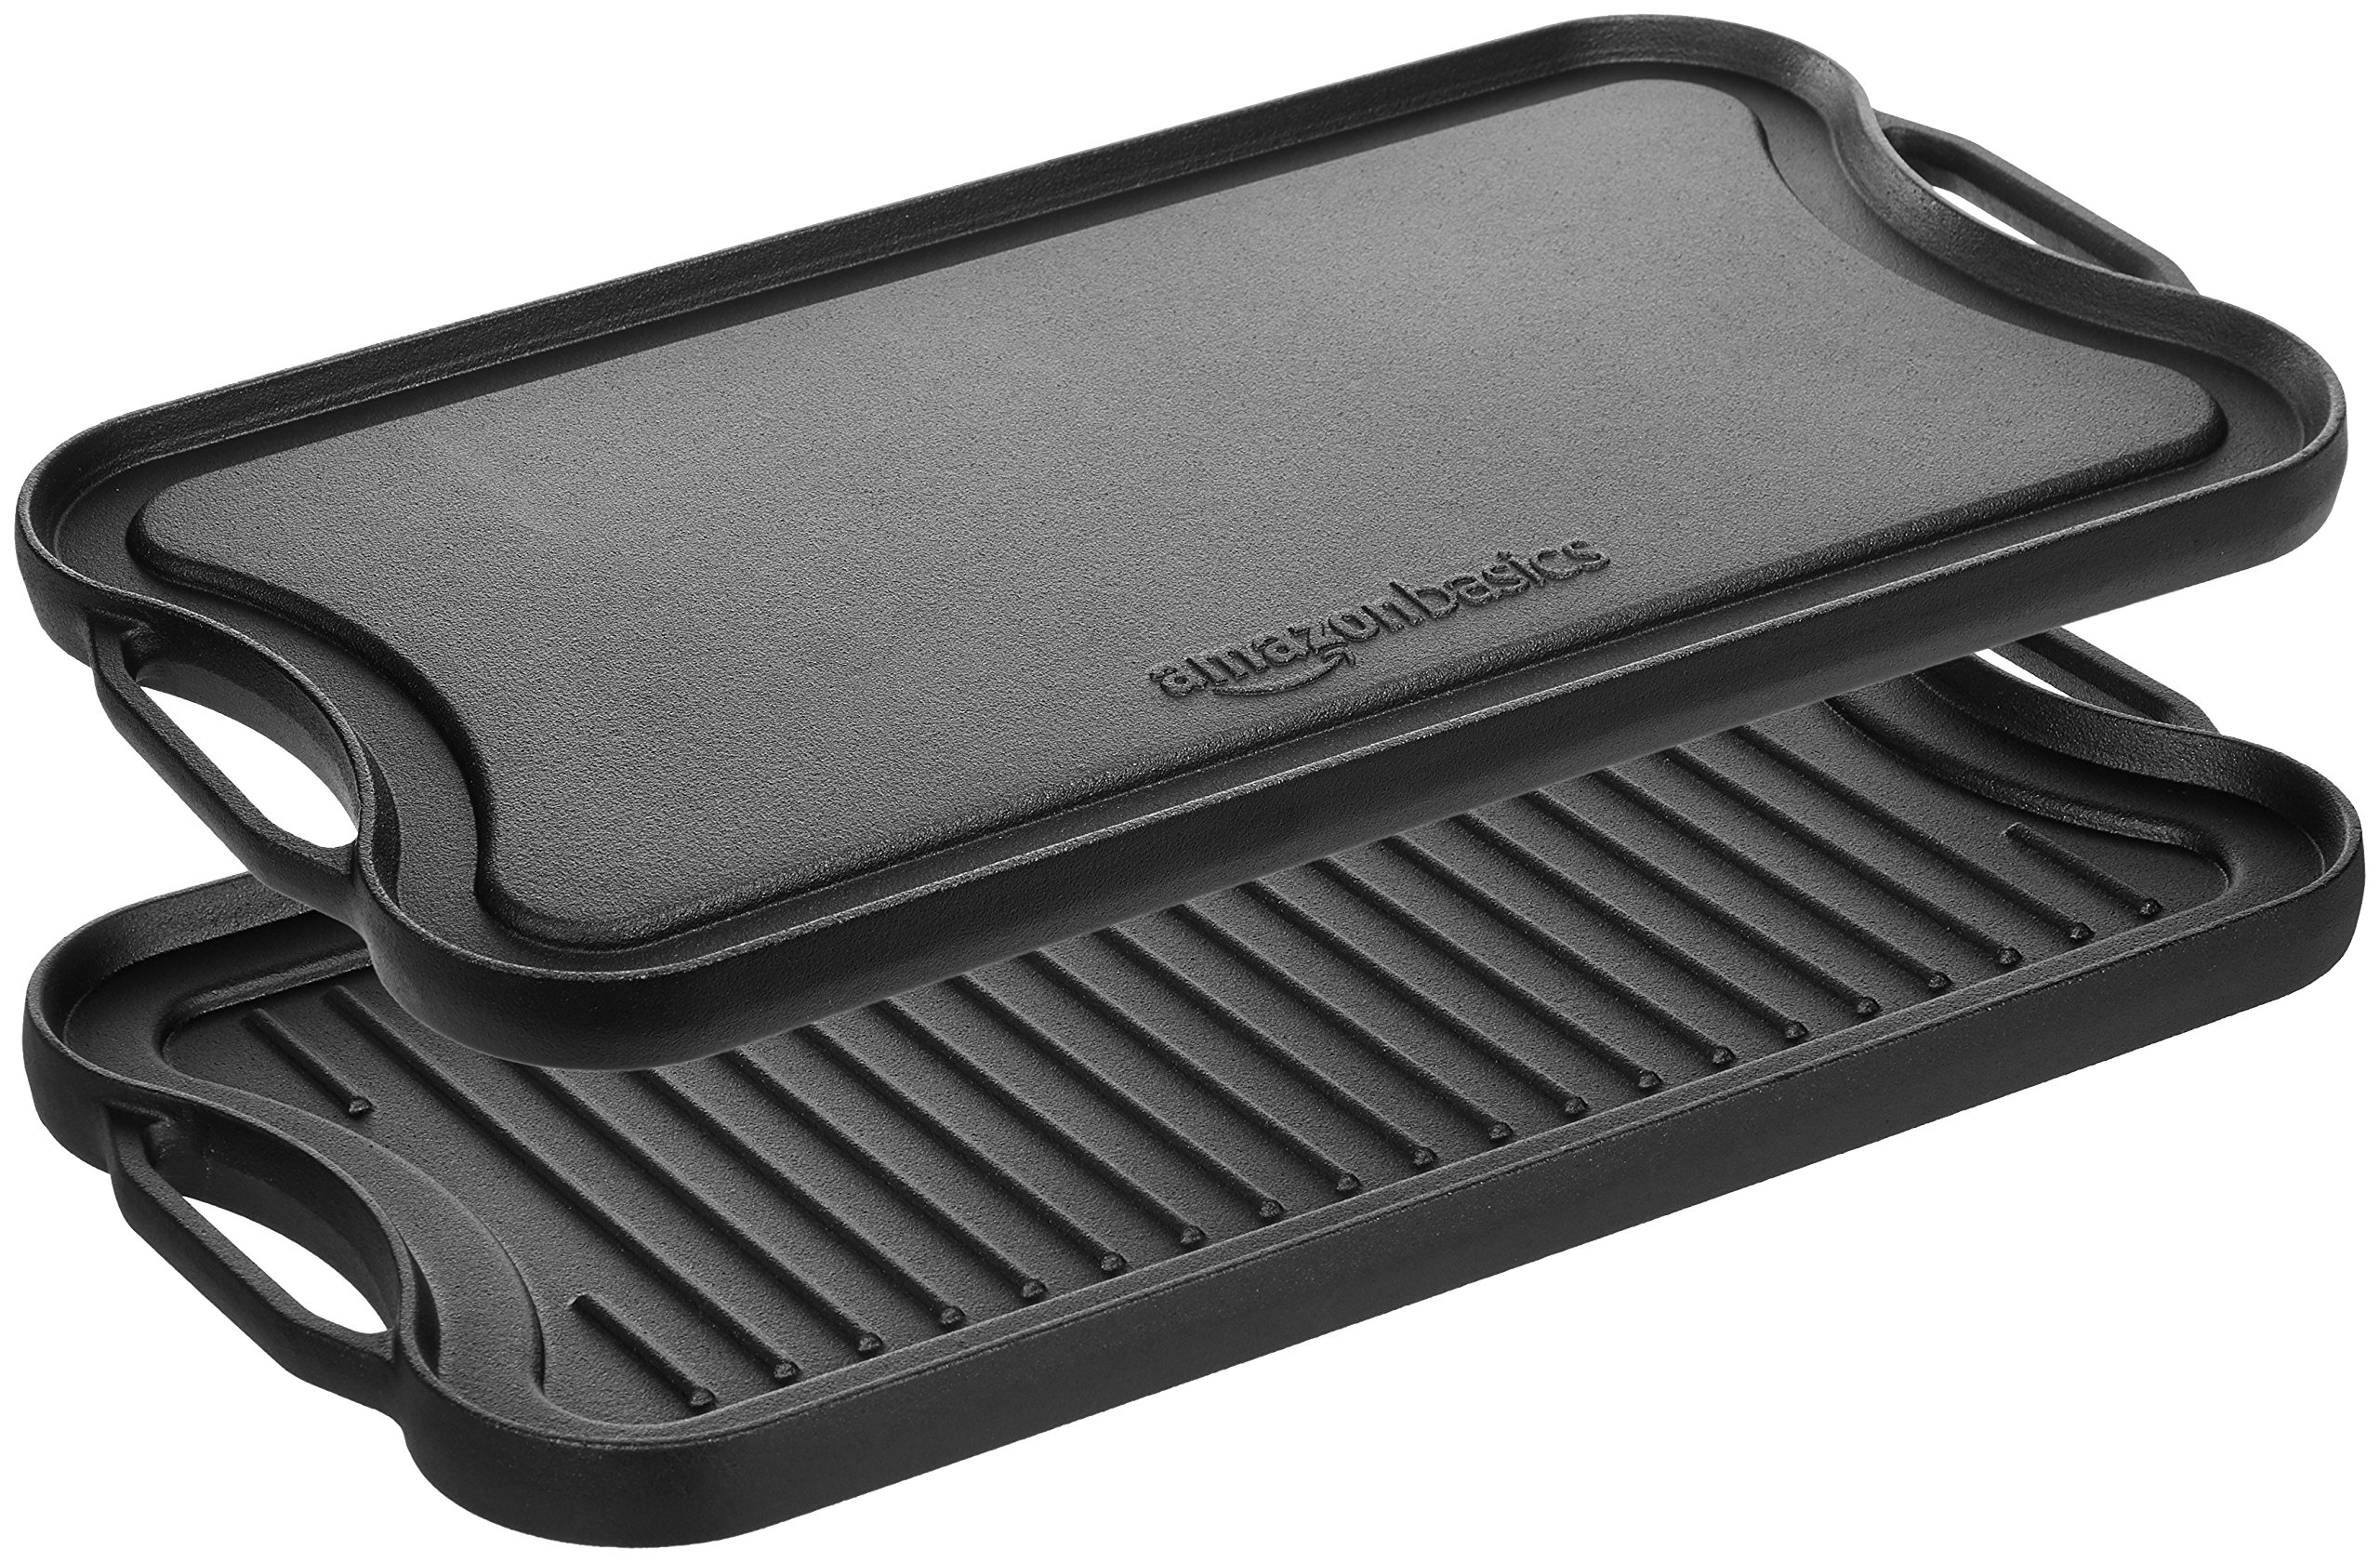 AmazonBasics Pre-Seasoned Cast Iron Reversible Grill/Griddle -(5204)